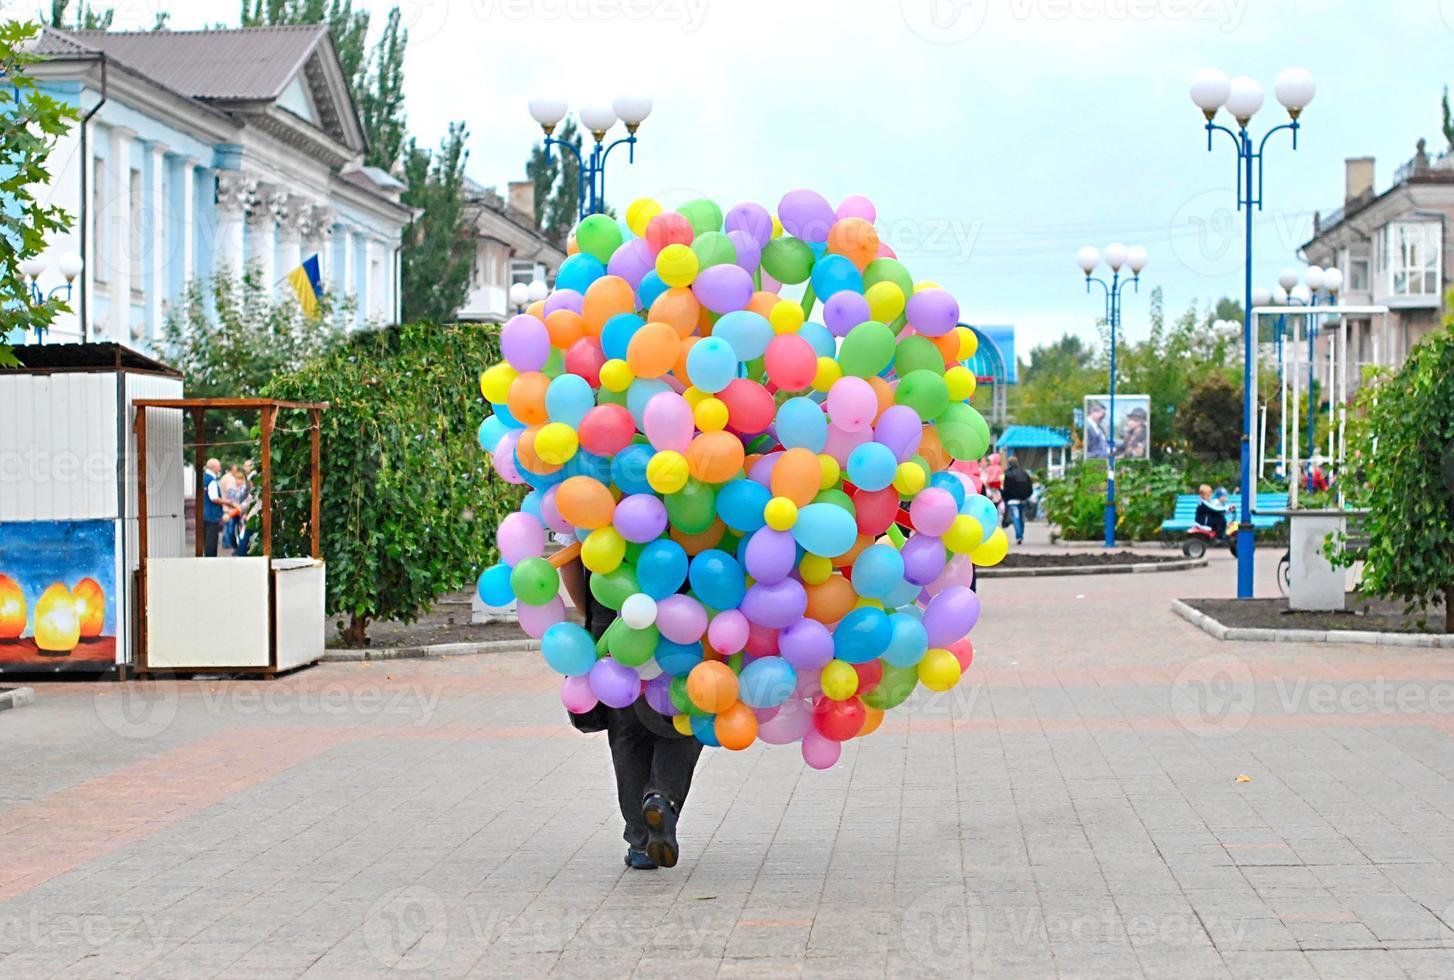 Mann trägt viele helle Luftballons foto